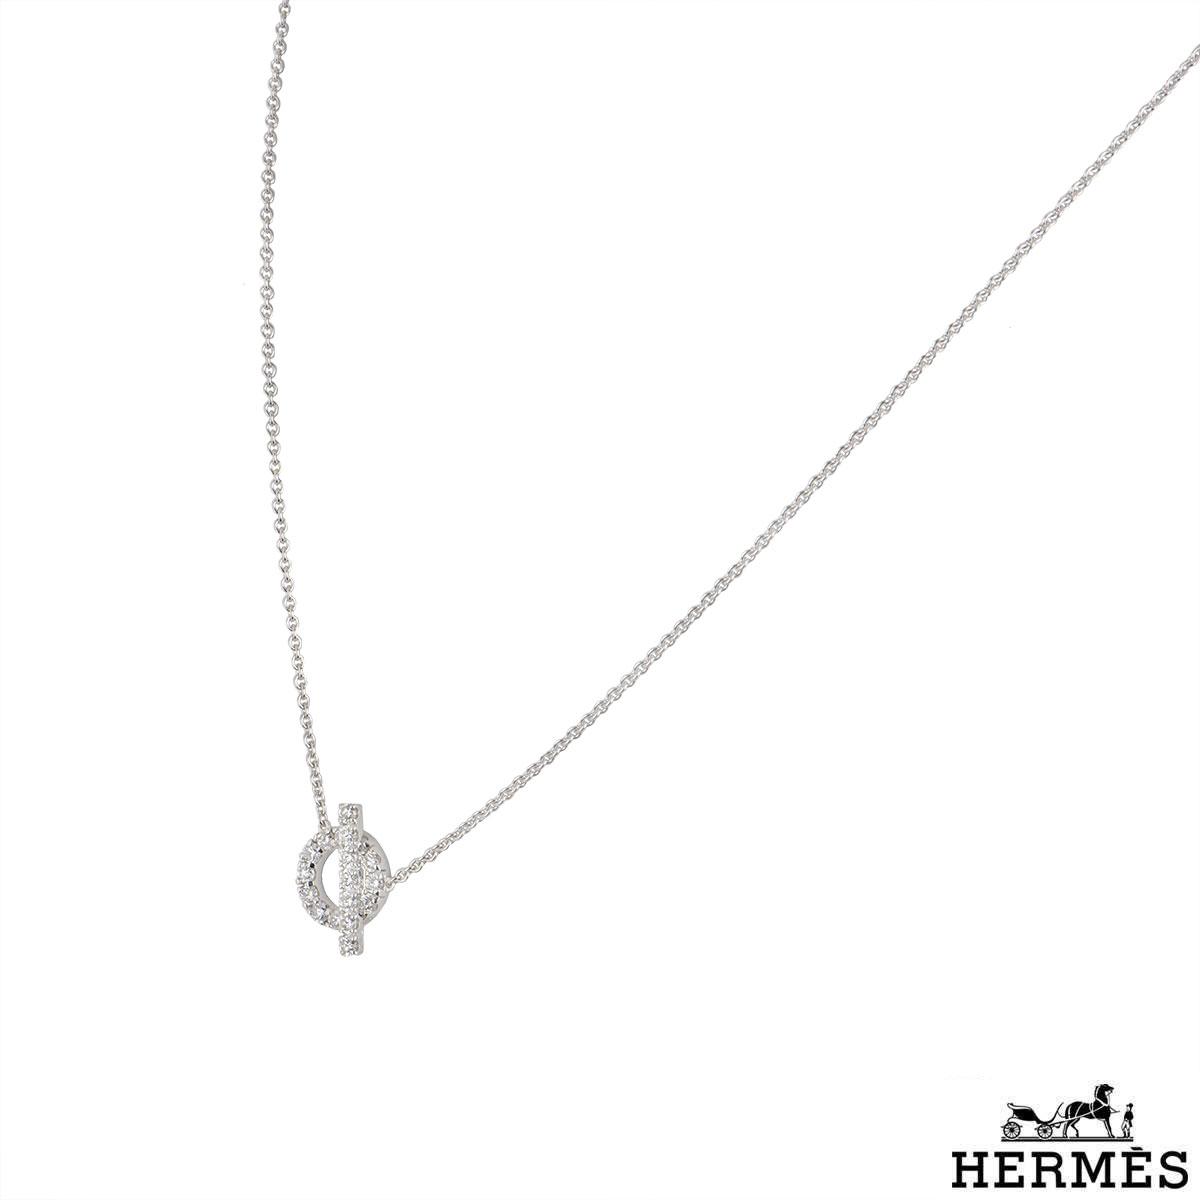 Hermès White Gold Diamond Finesse Necklace